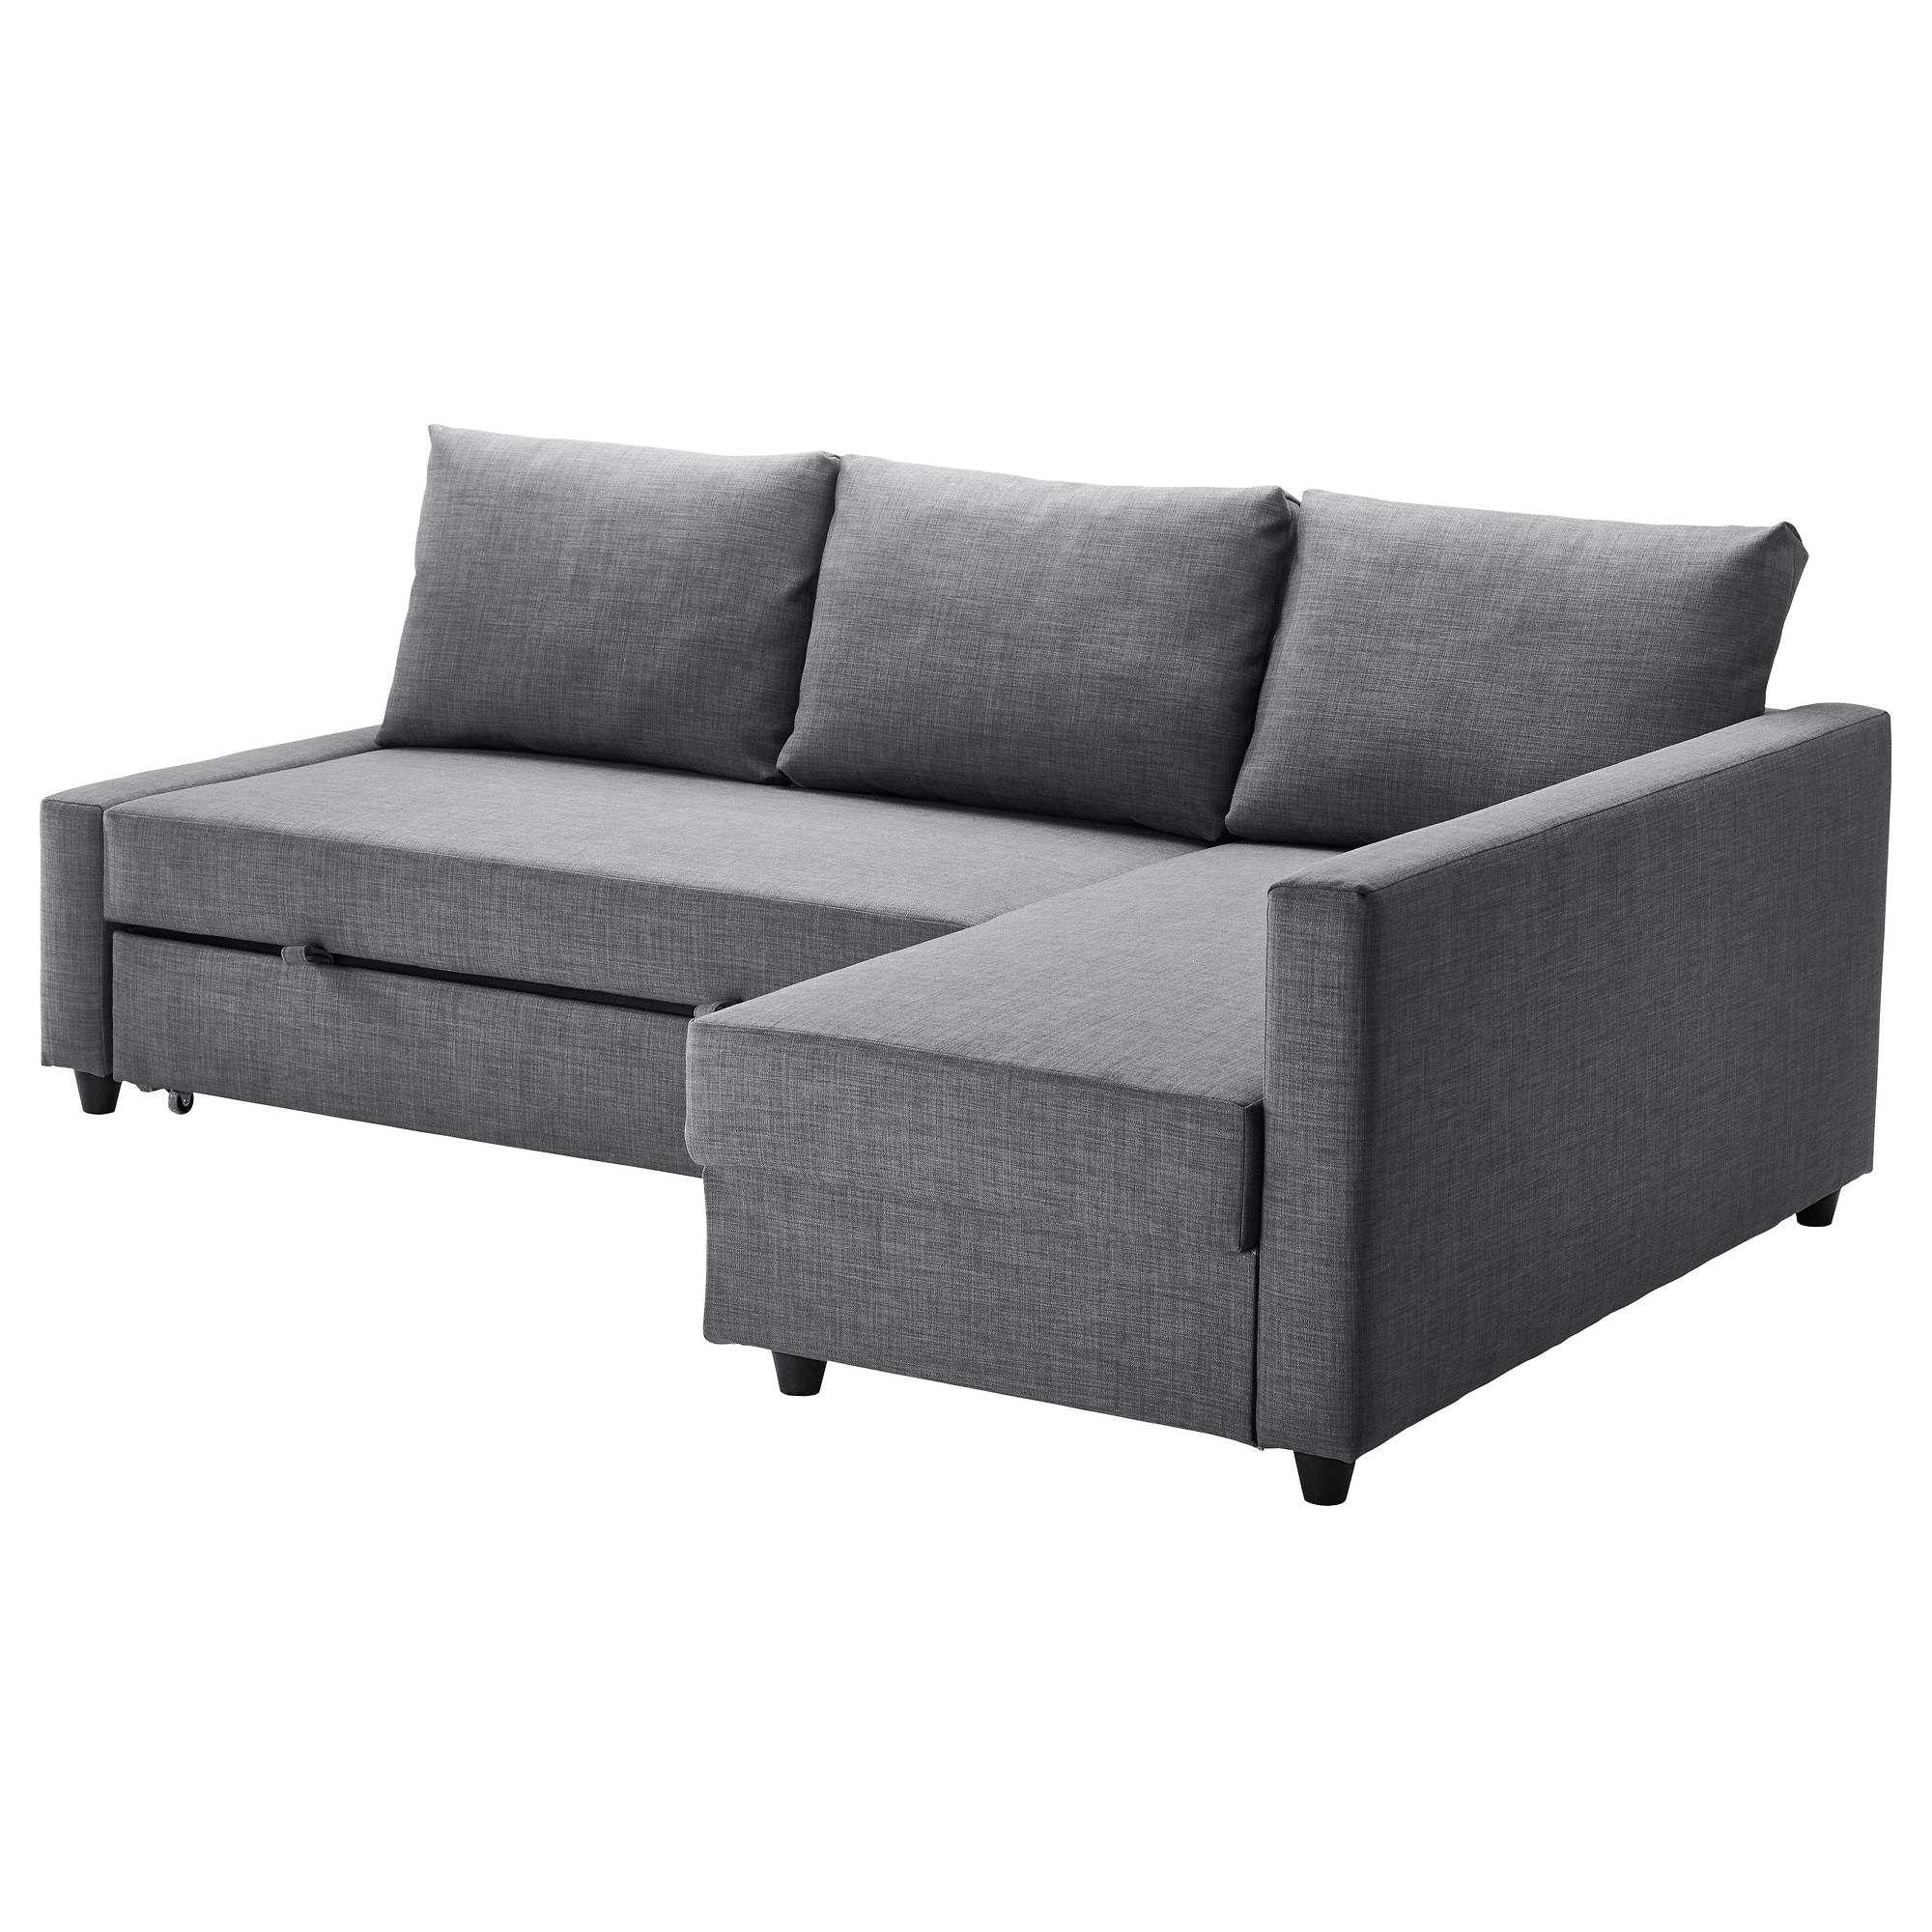 Friheten Corner Sofa Bed With Storage Skiftebo Dark Grey – Ikea Throughout London Dark Grey Sofa Chairs (Image 6 of 20)